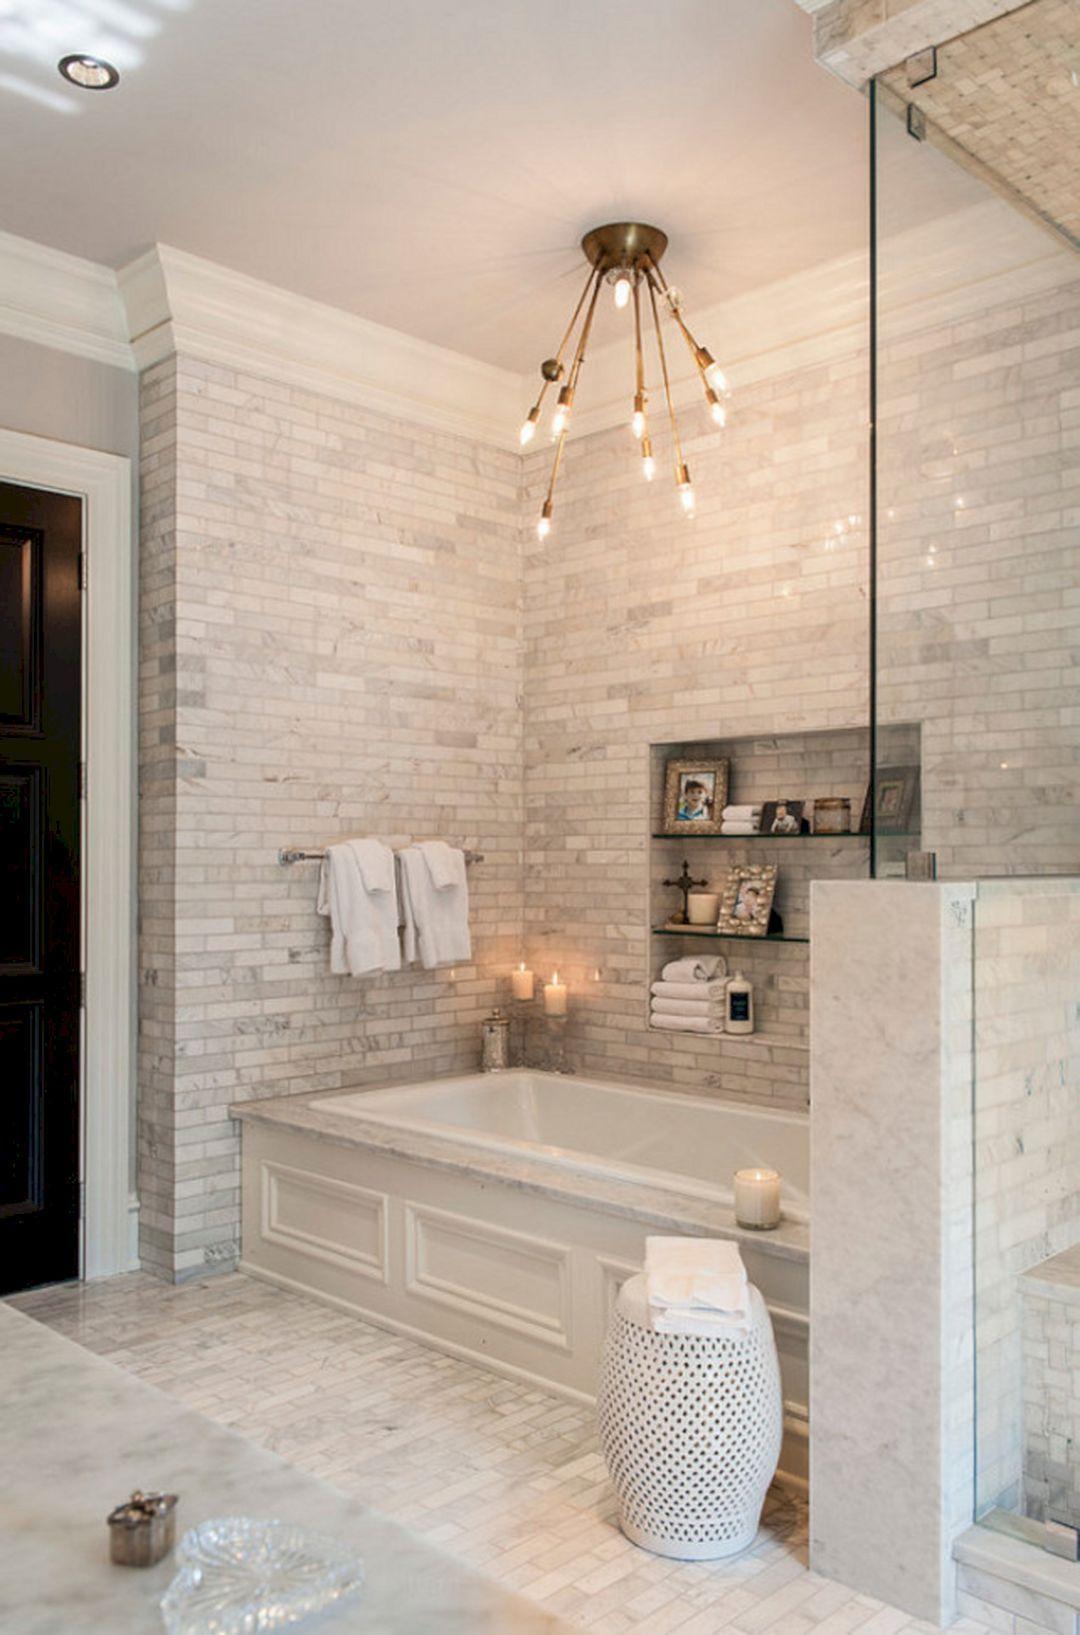 Nice Awesome Ceramic Tile For Bathroom: 65+ Best Inspirations https://freshouz.com/awesome-ceramic-tile-for-bathroom-65-best-inspirations/